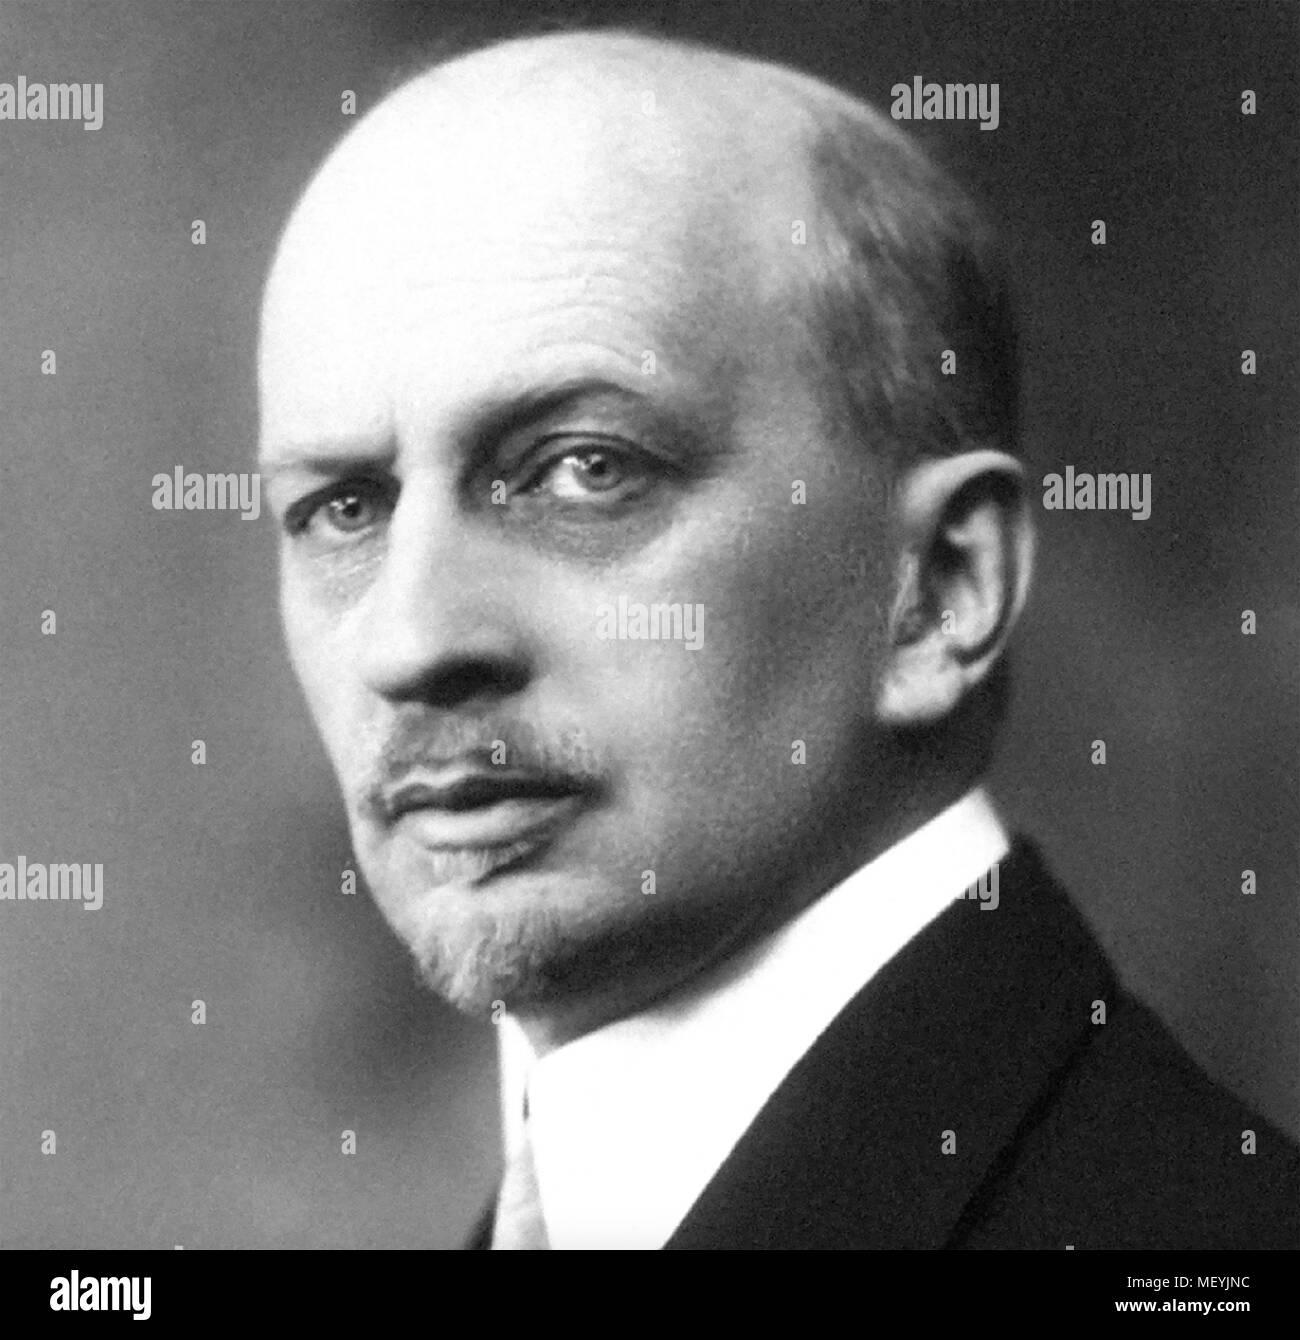 IVAN ILYIN (1883-1954) Russian political and religious philosopher - Stock Image